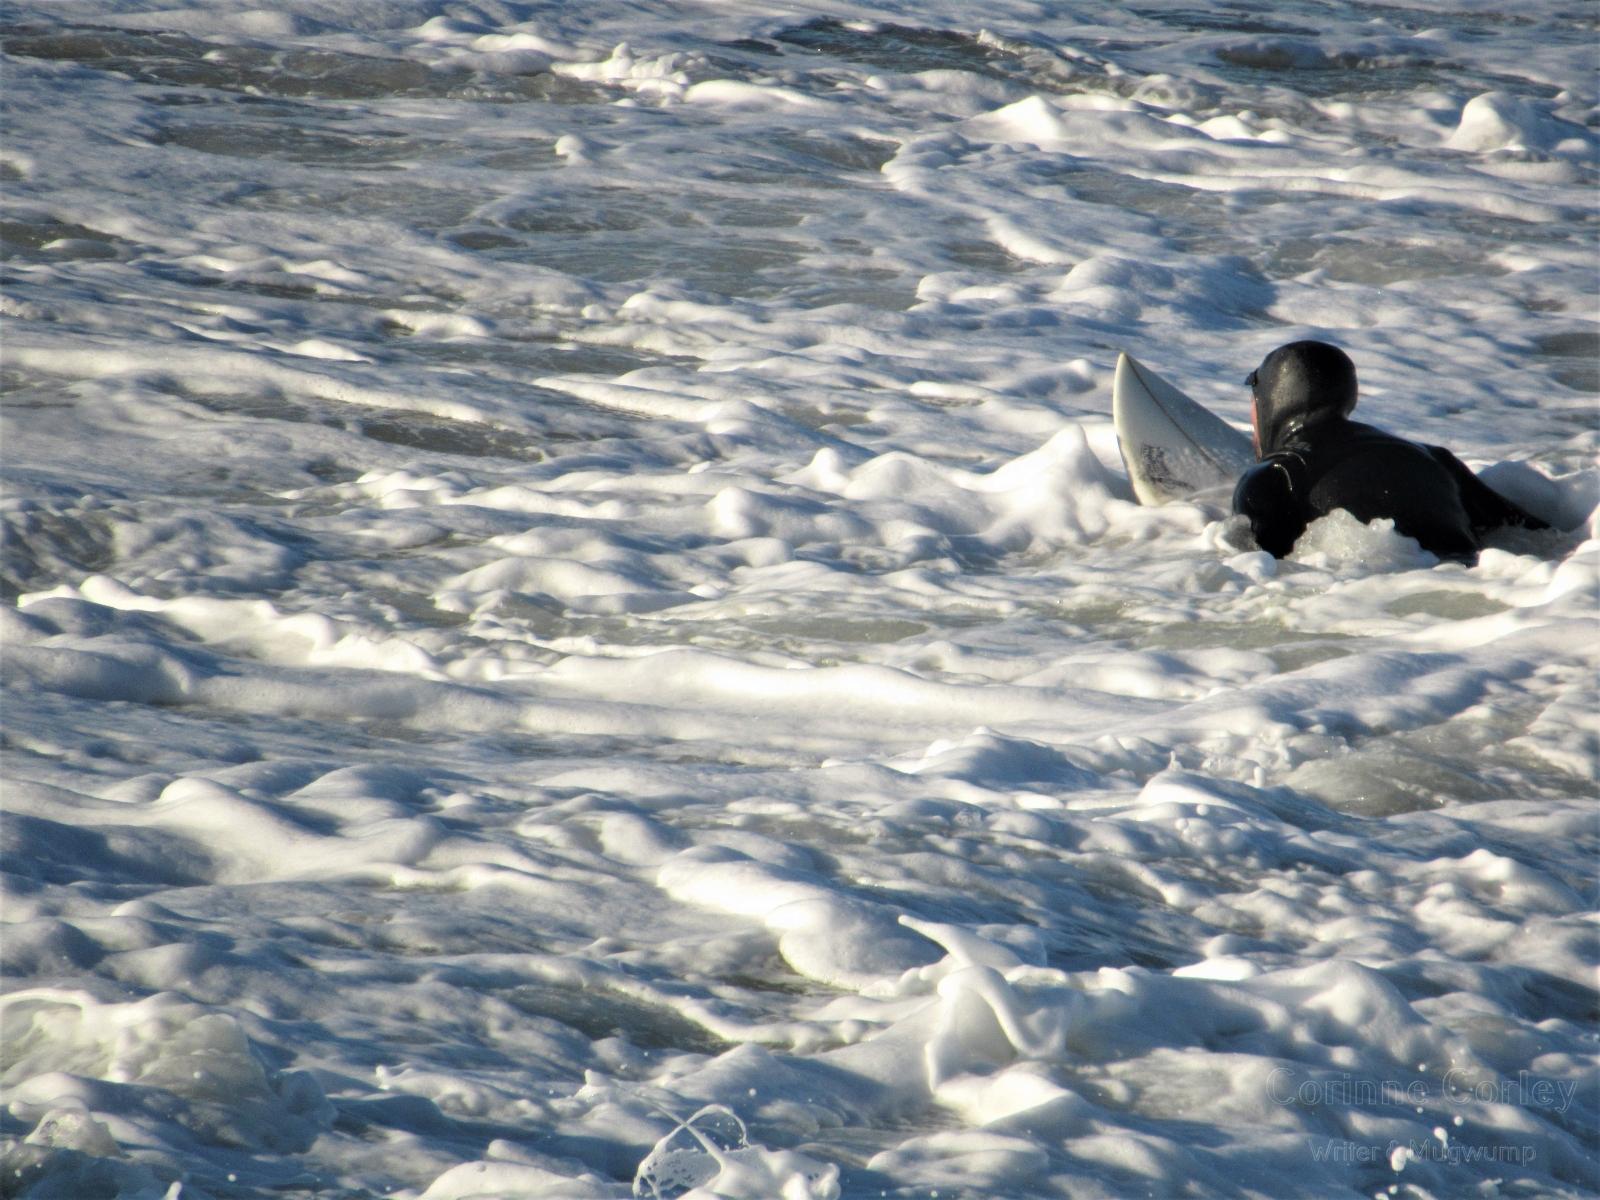 Board and sea foam